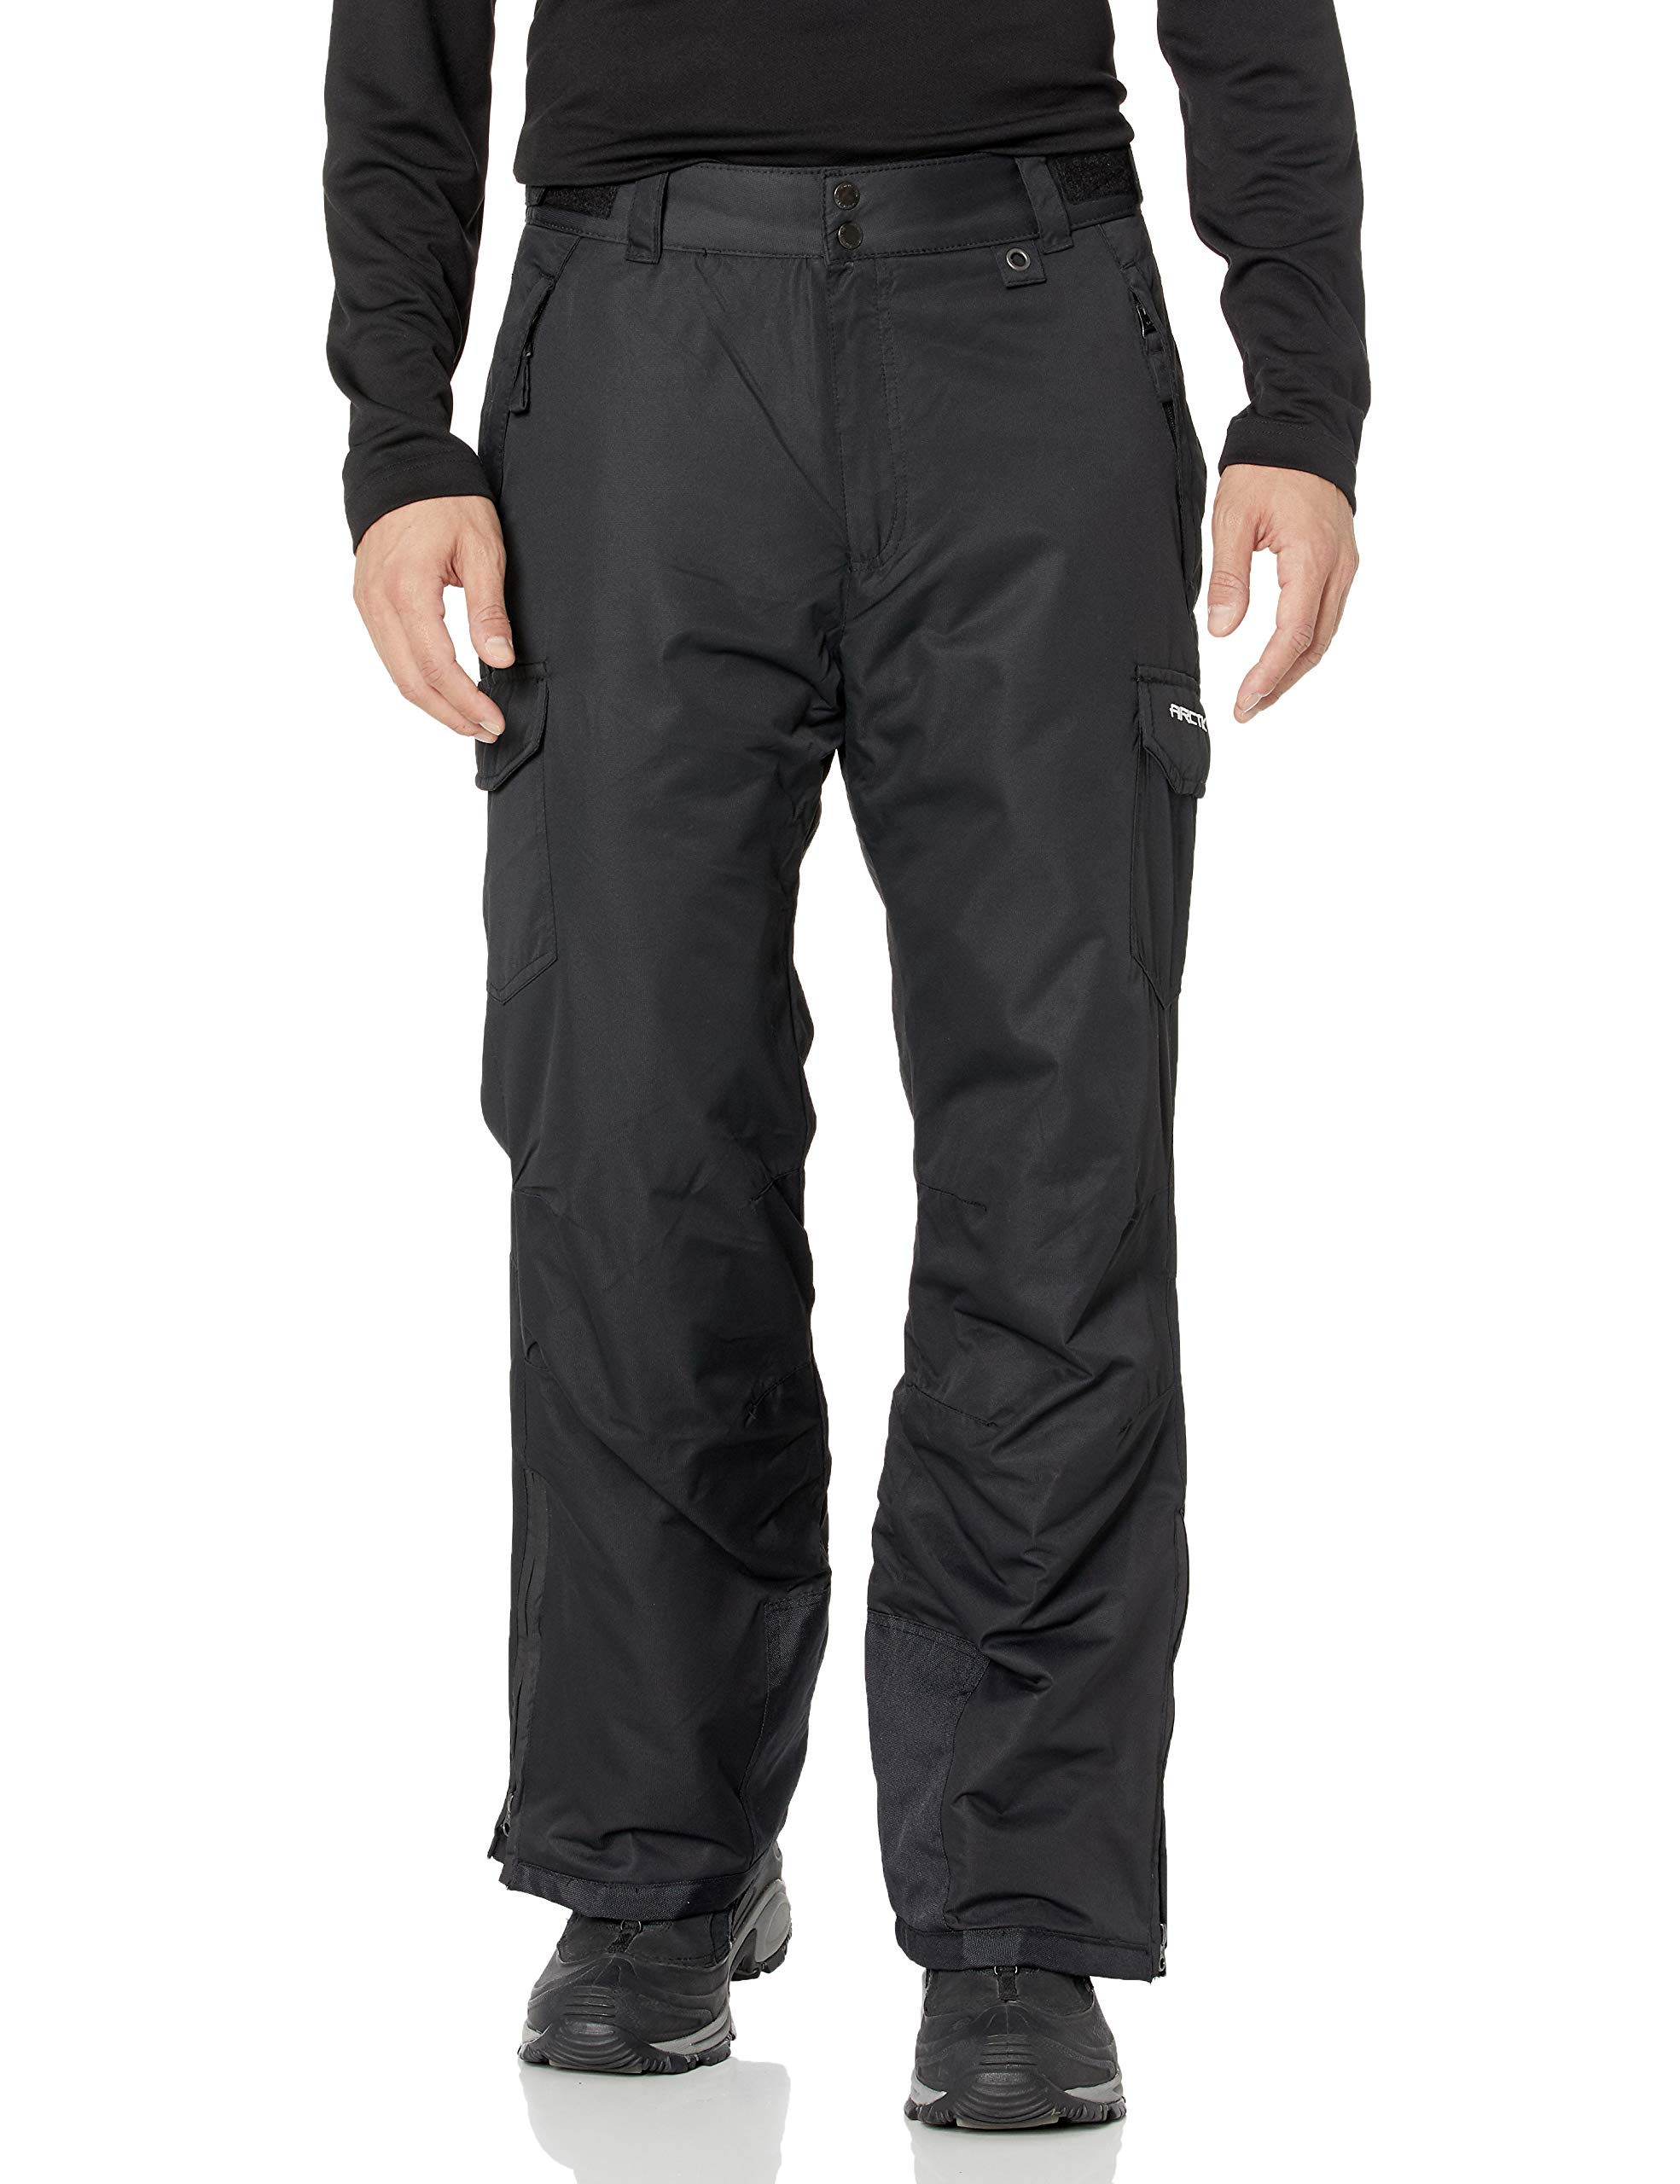 Arctix Men's Snow Sports Cargo Pants, Black, 3X-Large/36'' Inseam by Arctix